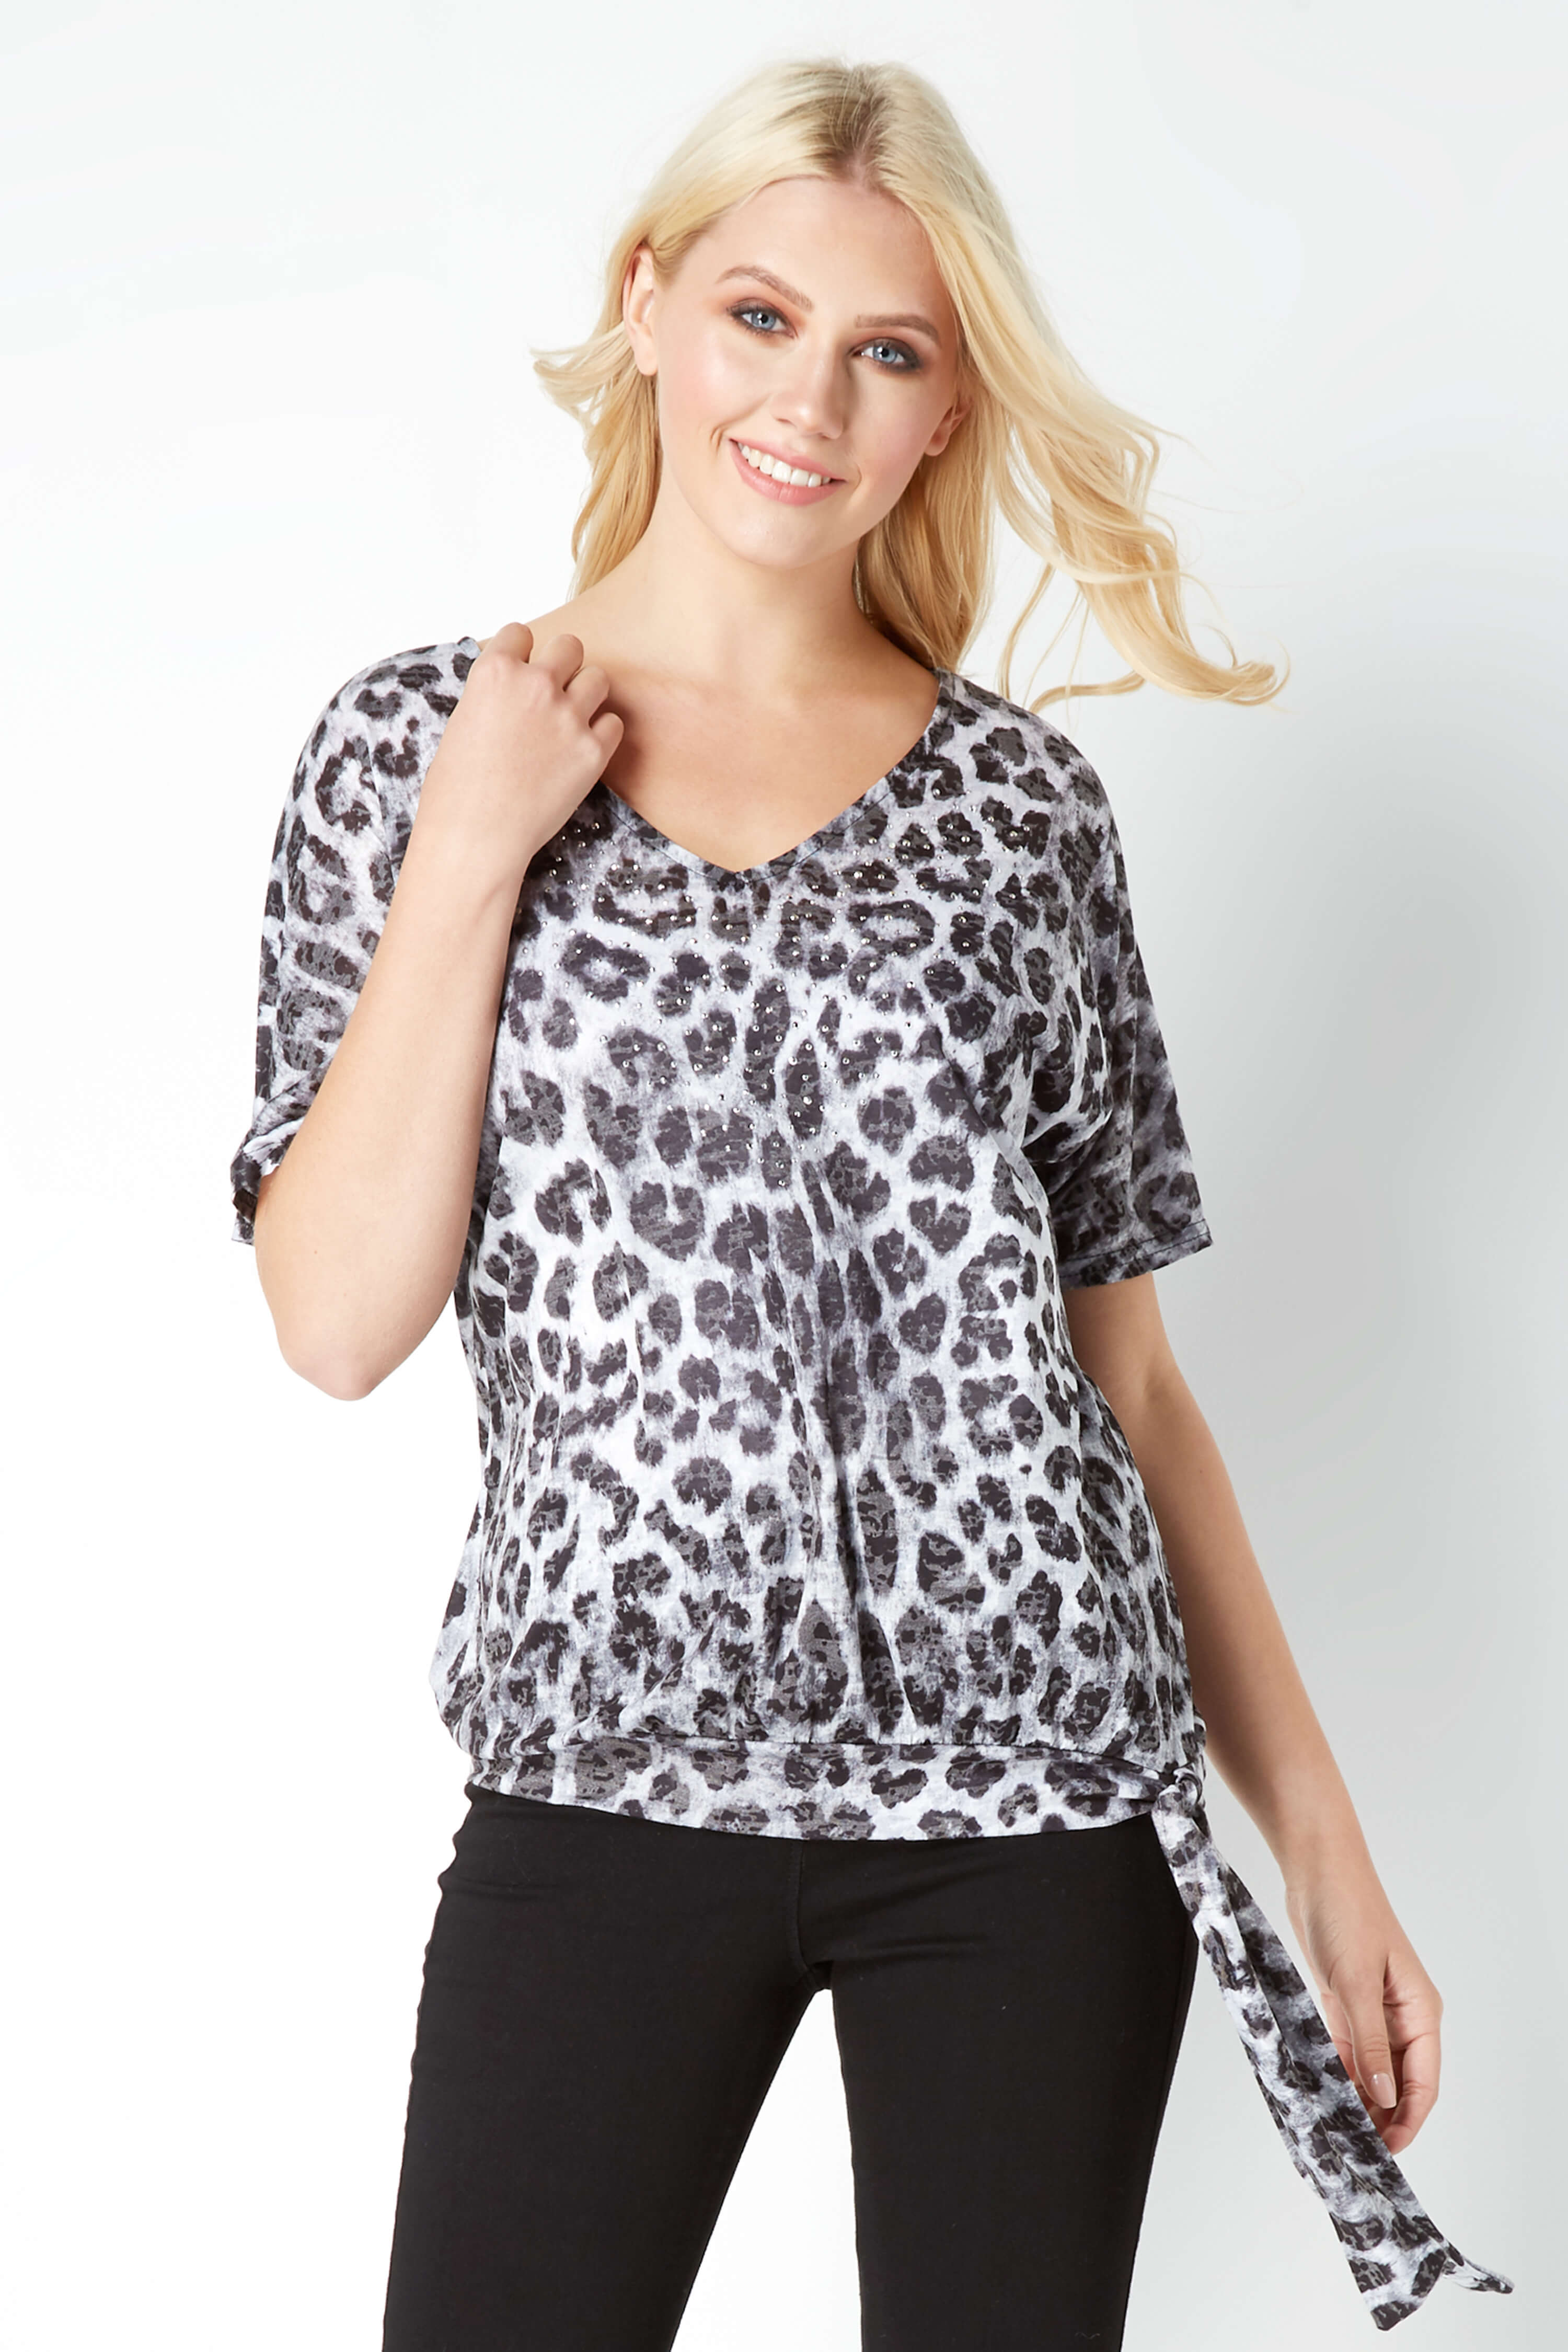 Roman Originals Women/'s Animal Print V-Neck Jersey Top Grey Sizes 10-20